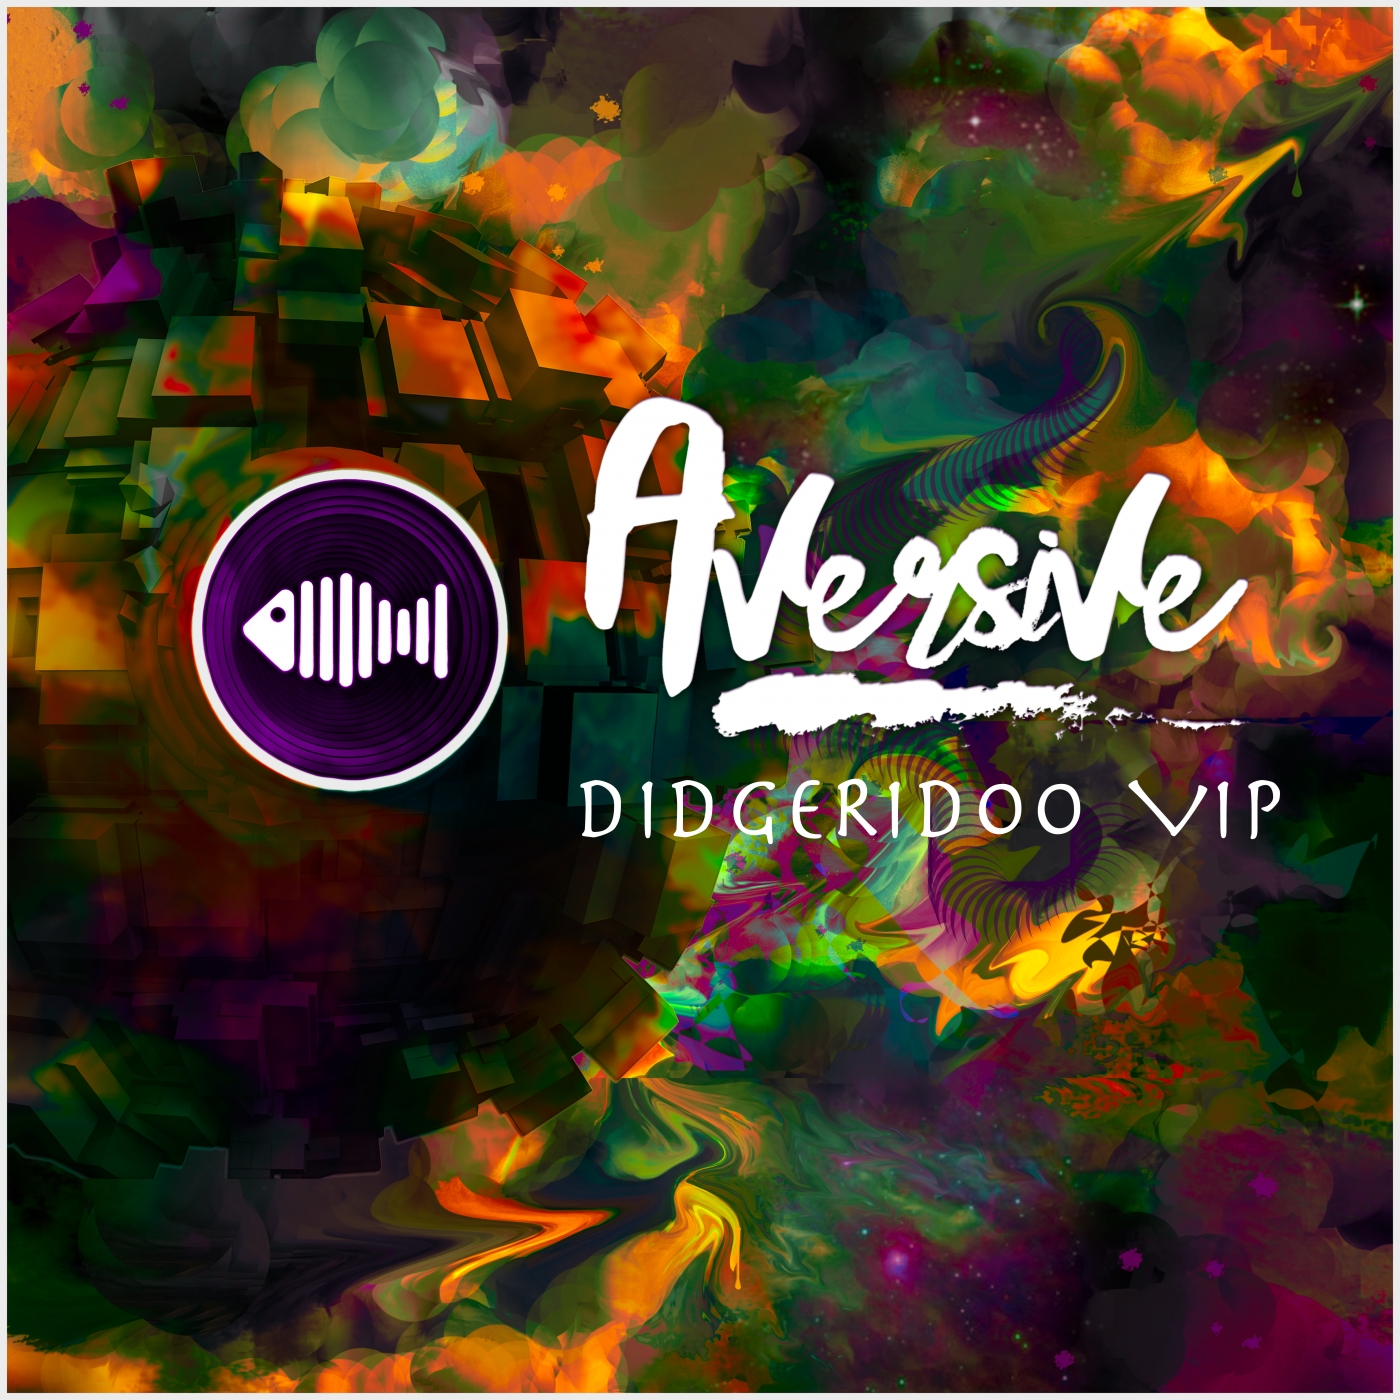 BTR017 - Aversive - Didgeridoo VIP